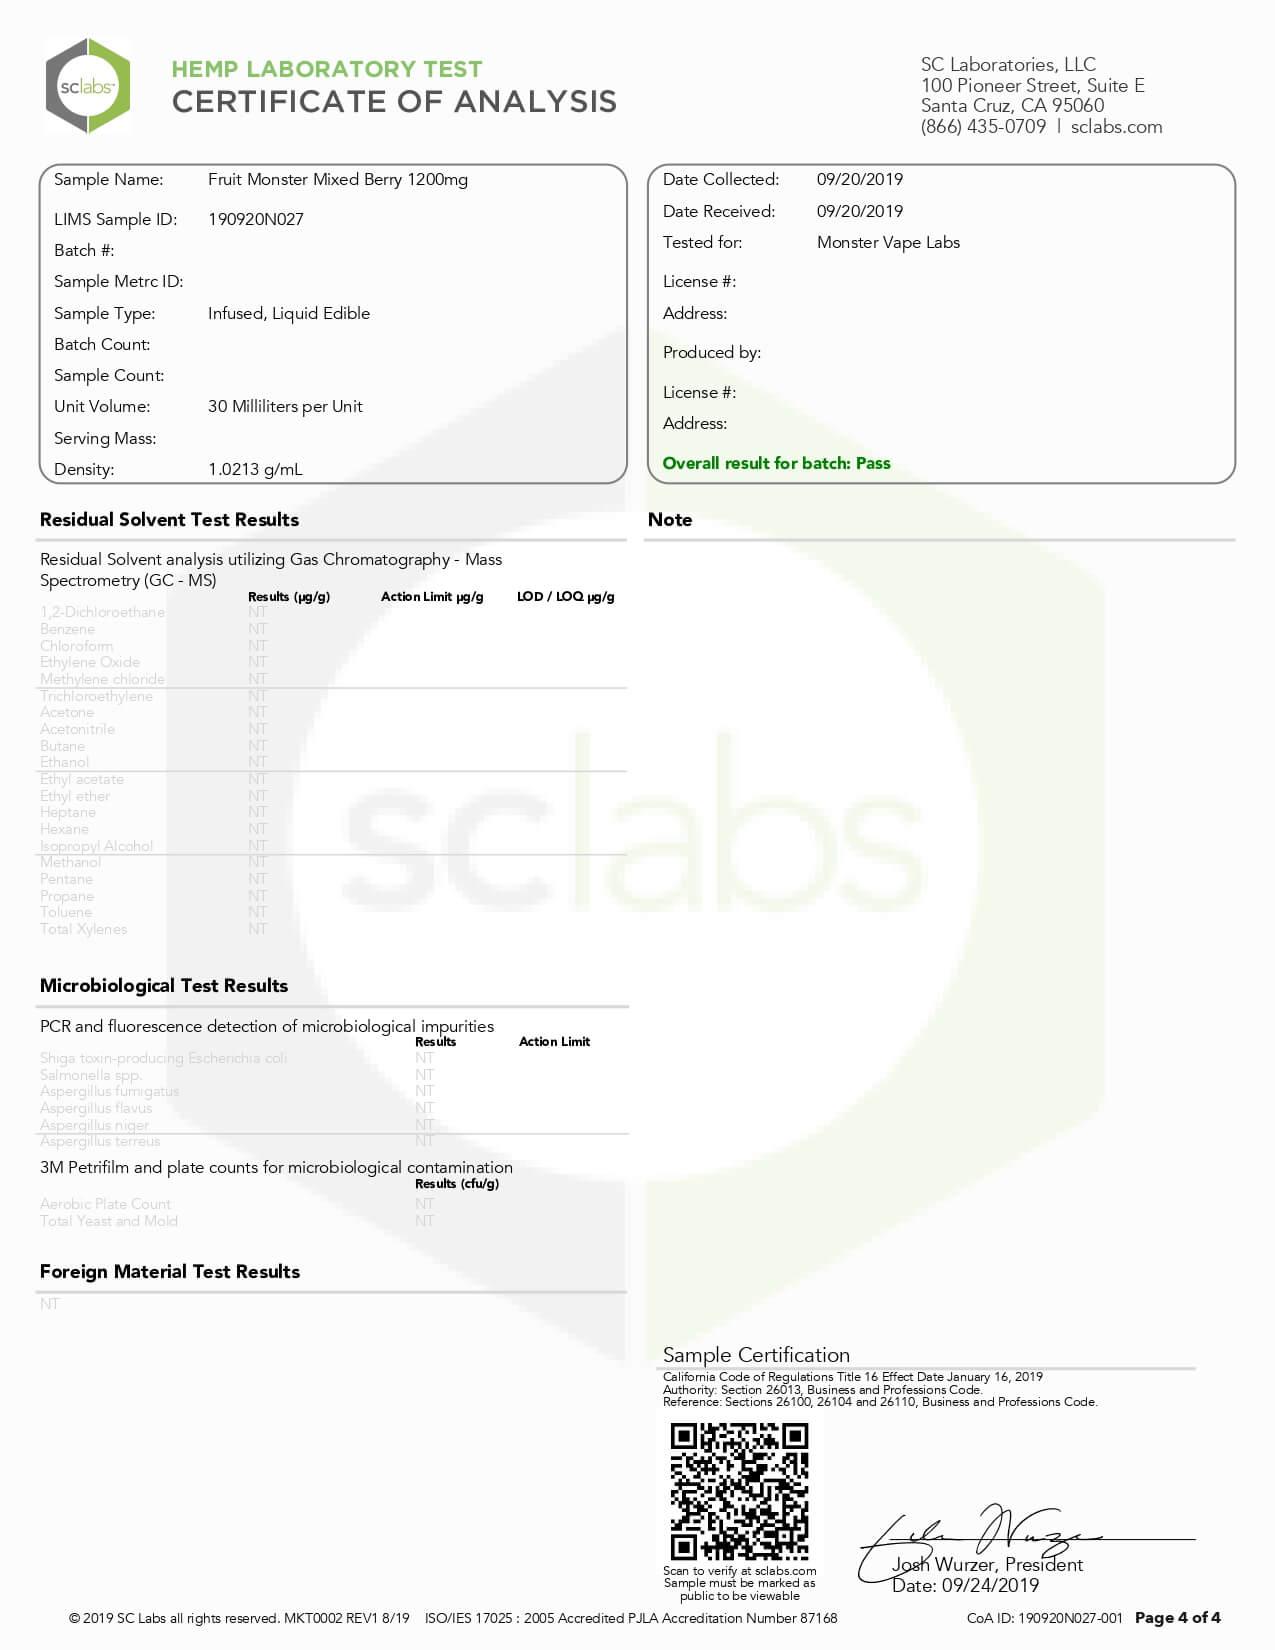 Fruit Monster CBD Vape Mixed Berry 1200mg Lab Report